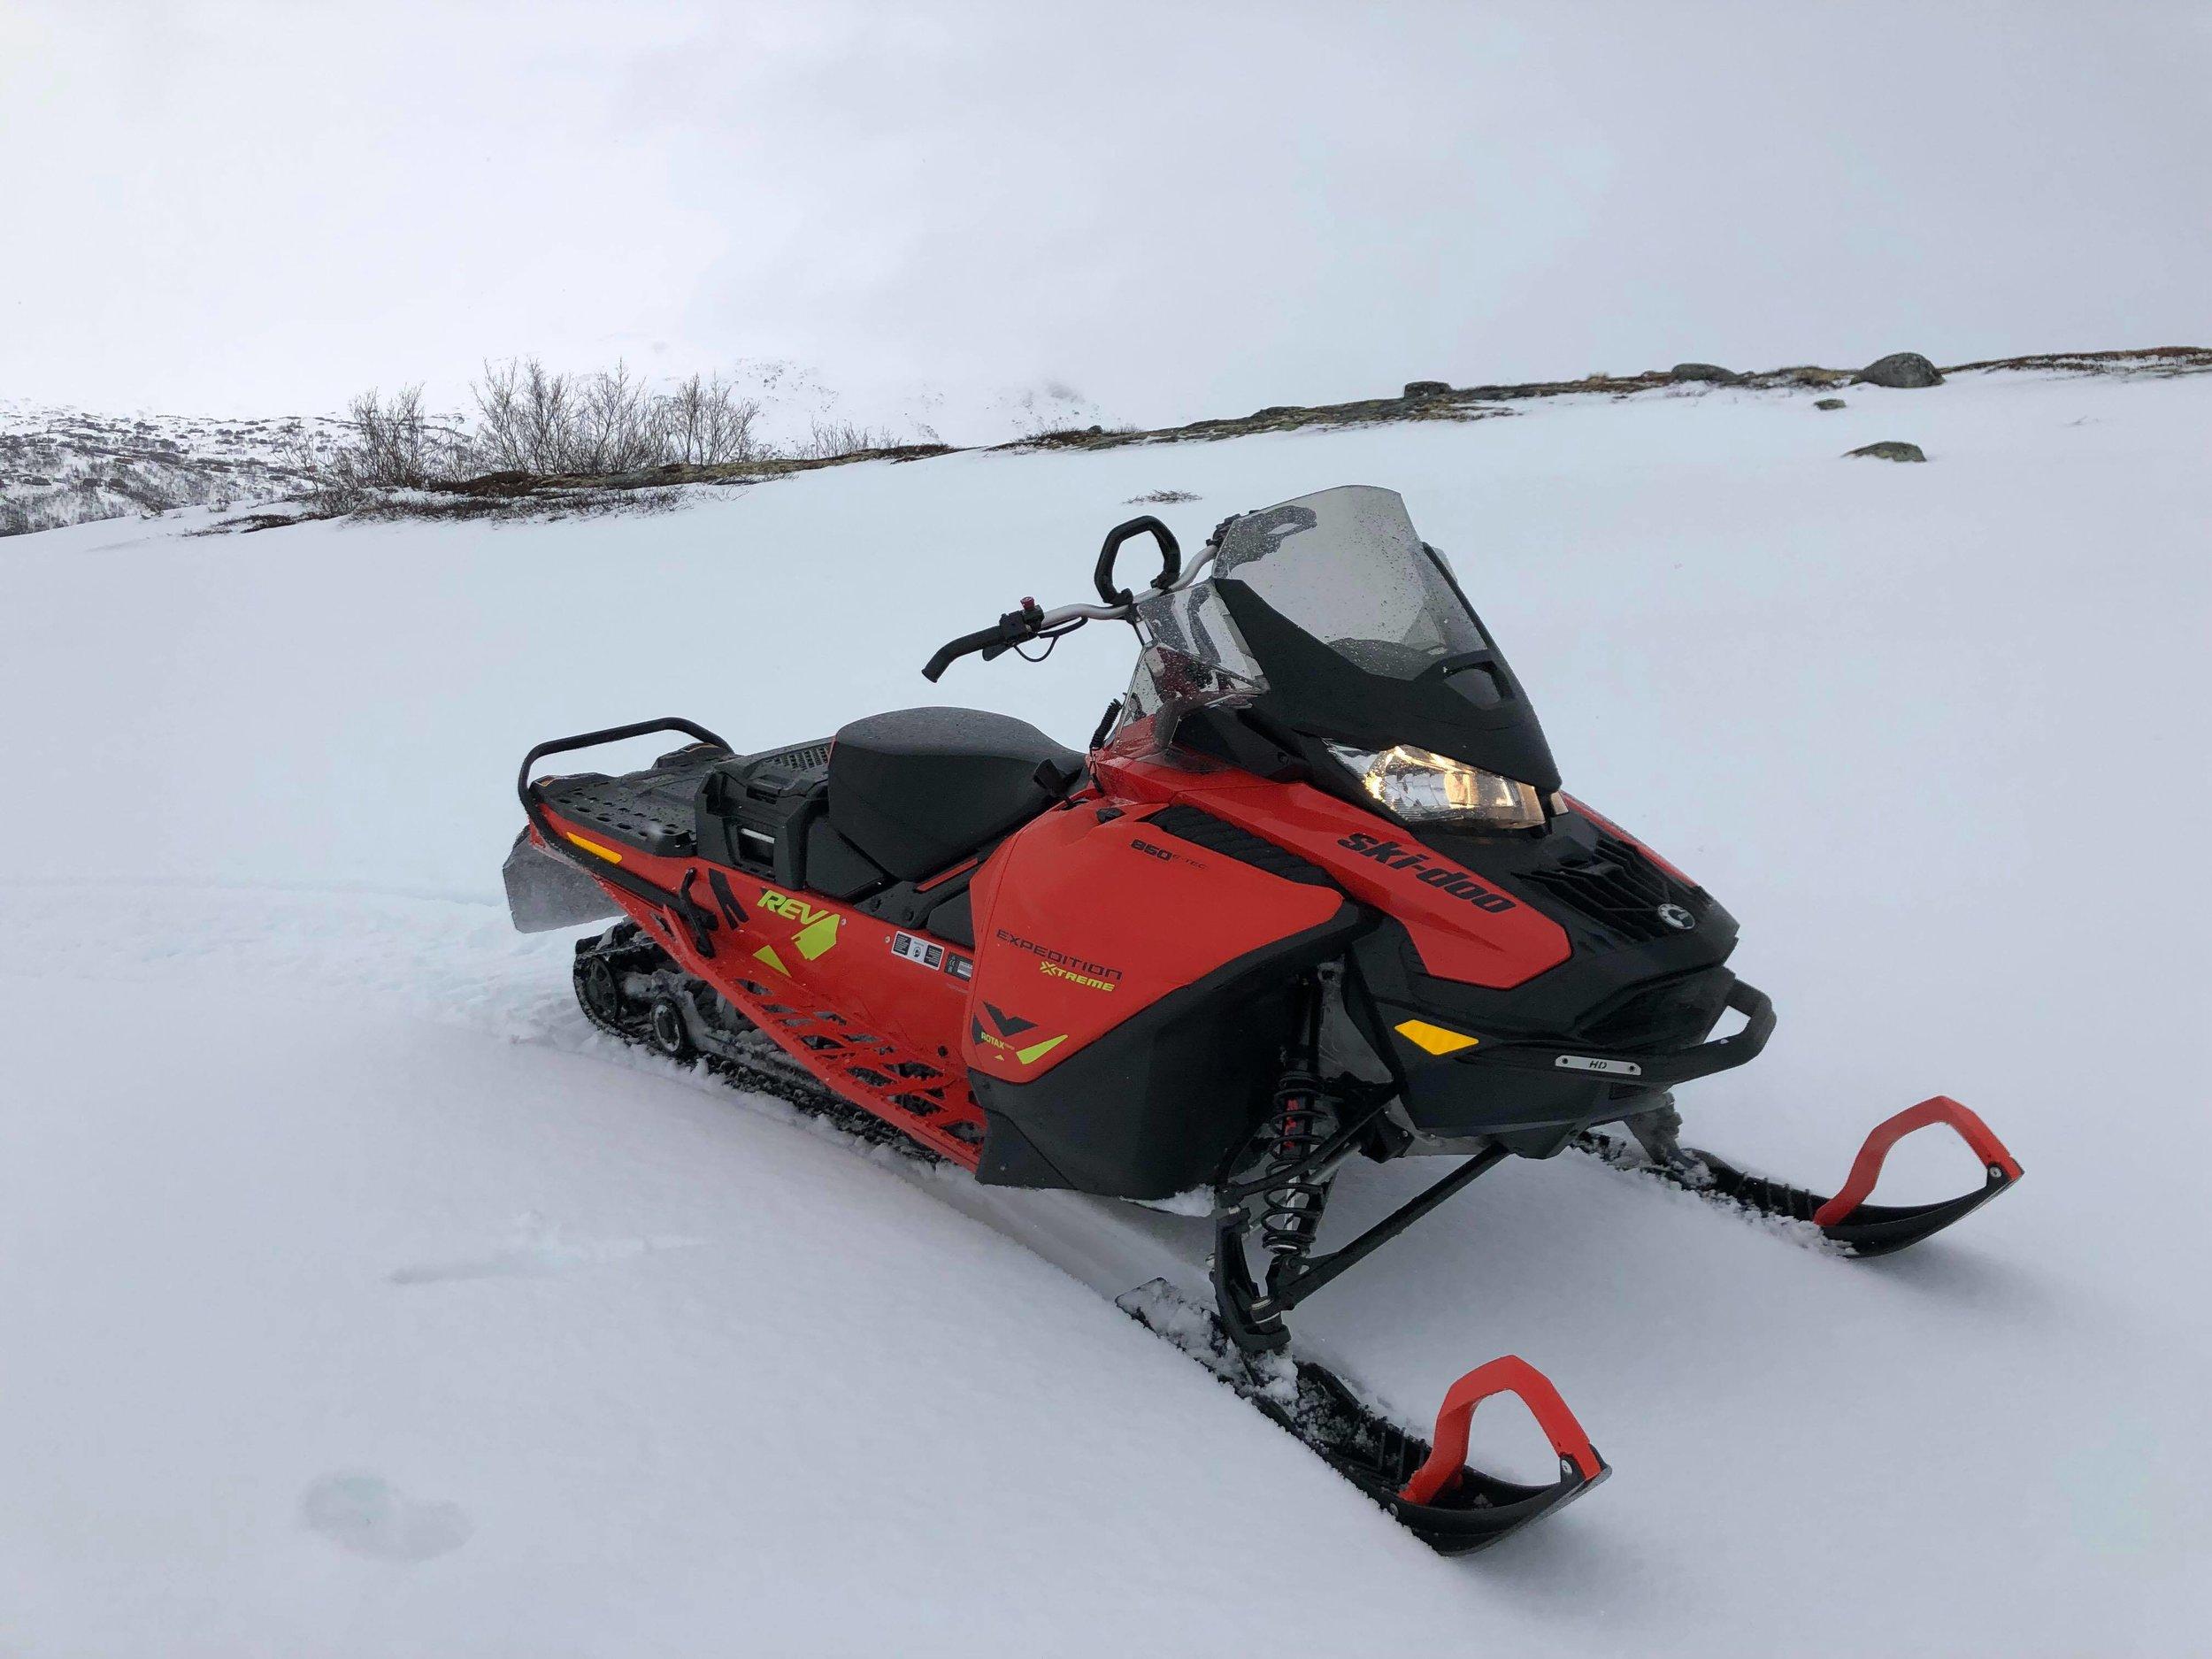 2020 Ski-Doo Expedition EXTREME 850